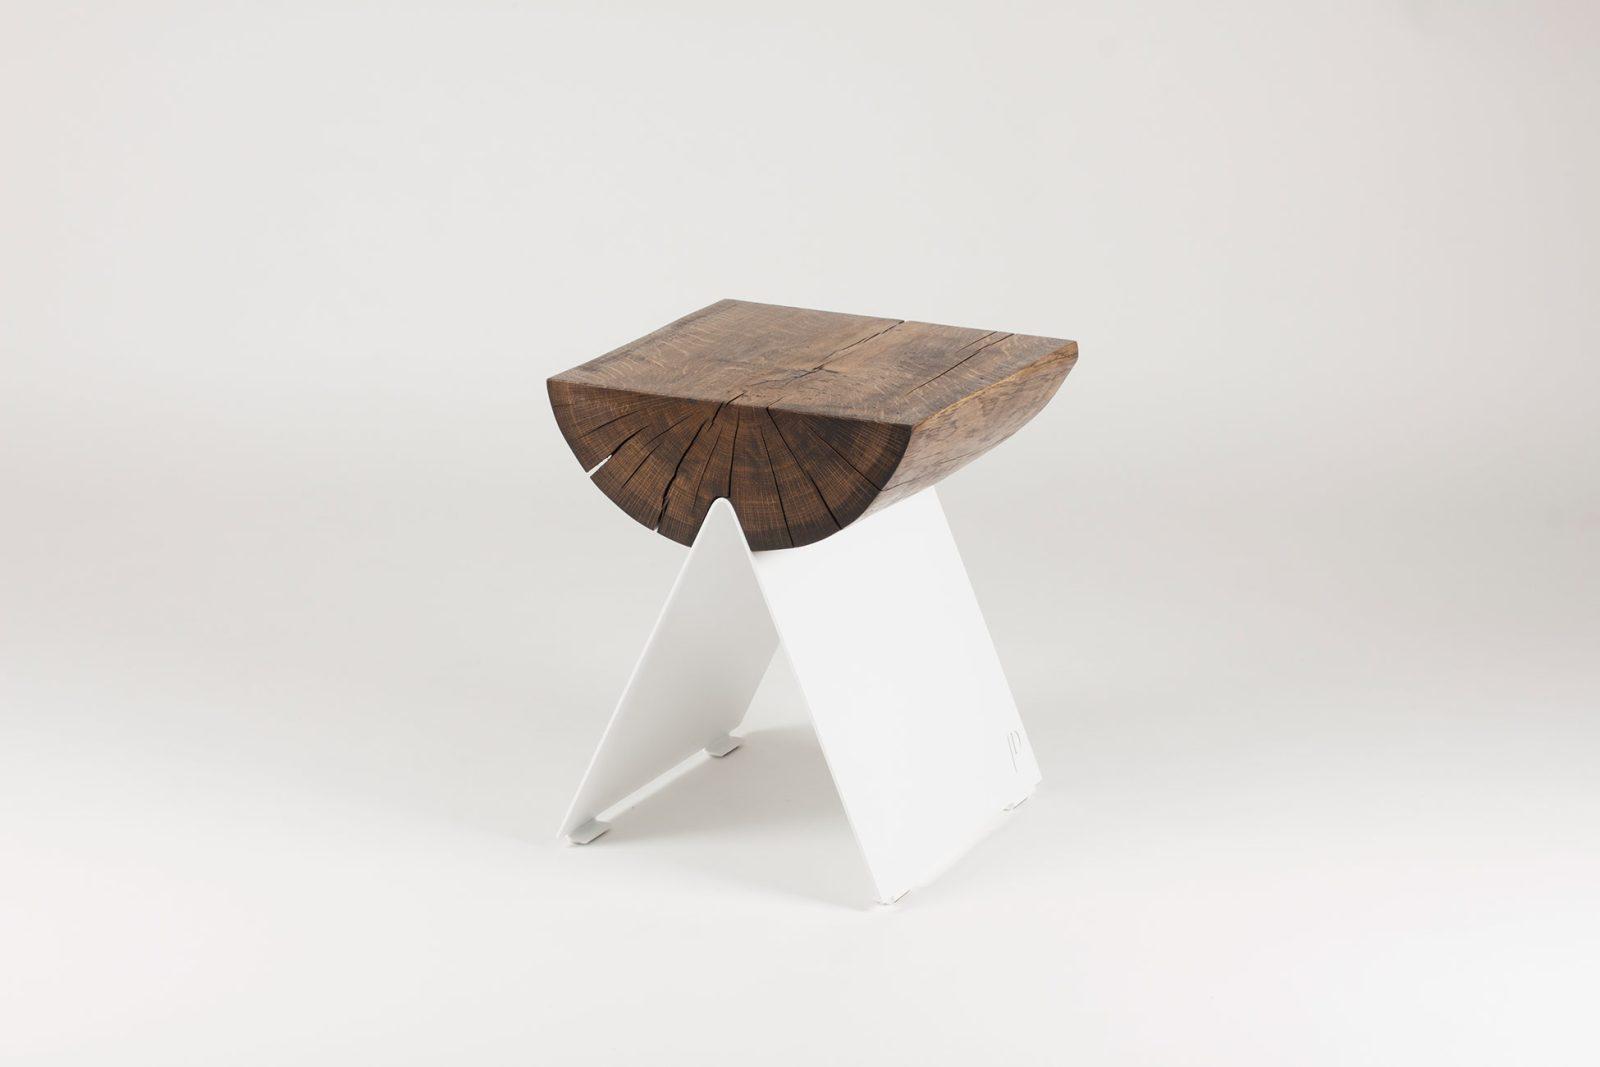 ½ Wooden Stool White-29566